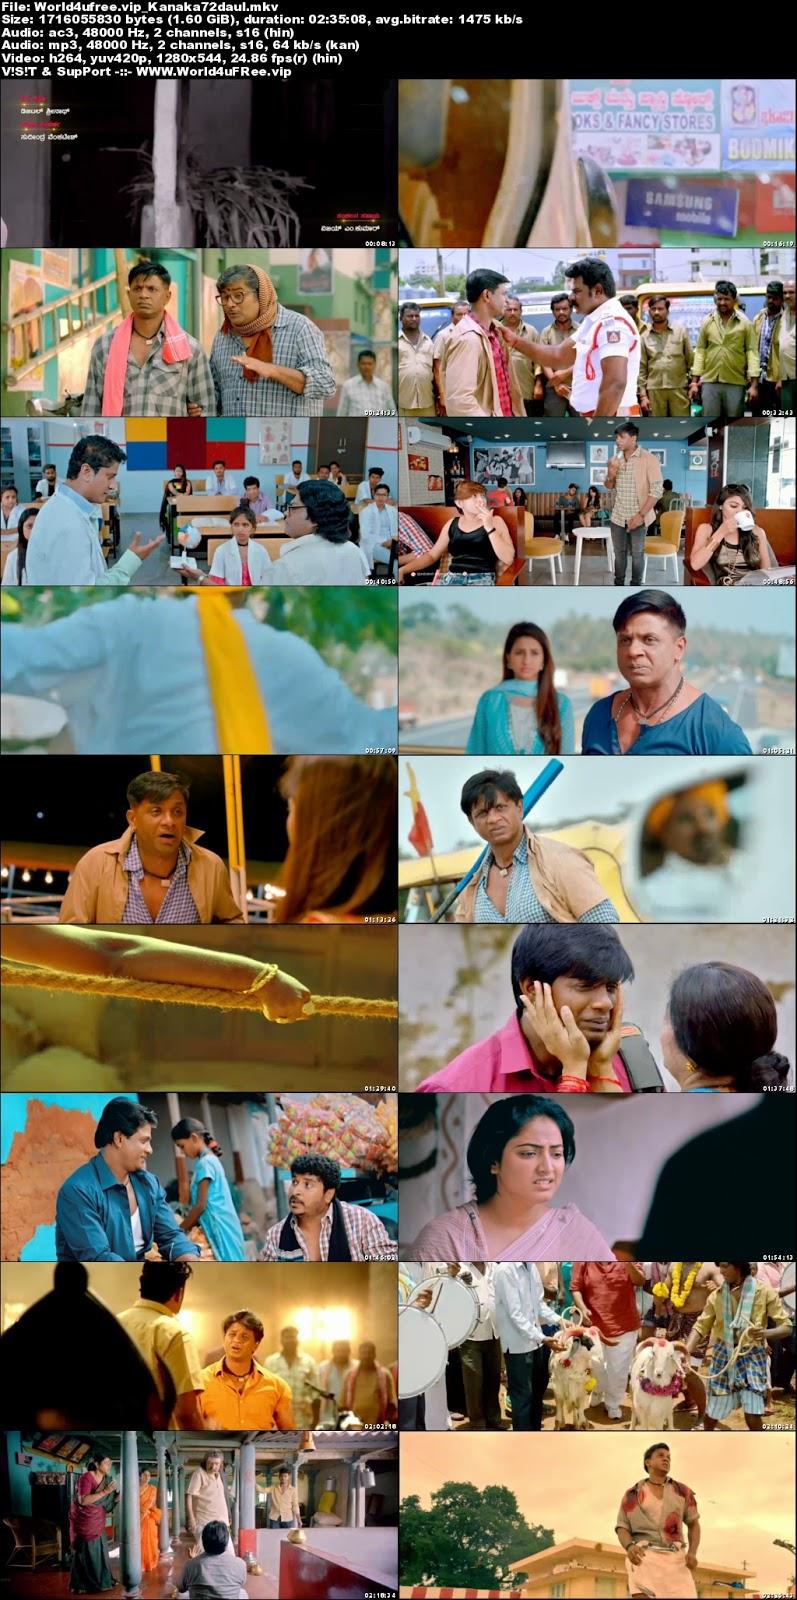 Kanaka 2018 Dual Audio 720p UNCUT HDRip Download x264 world4ufree.vip , South indian movie Kanaka 2018 hindi dubbed world4ufree.vip 720p hdrip webrip dvdrip 700mb brrip bluray free download or watch online at world4ufree.vip